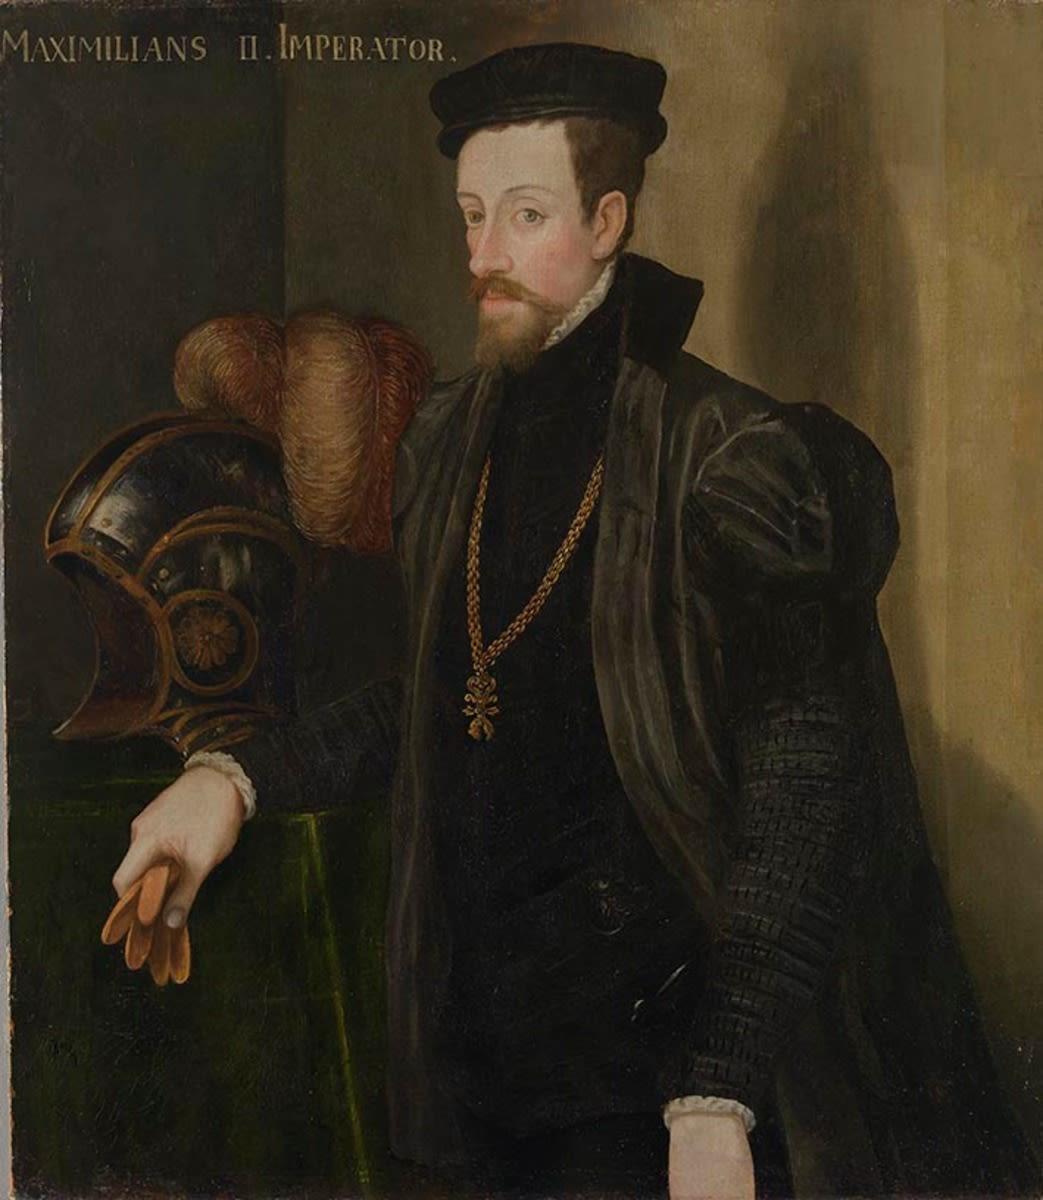 Bildnis Kaiser Maximilians II. (1525-1576)